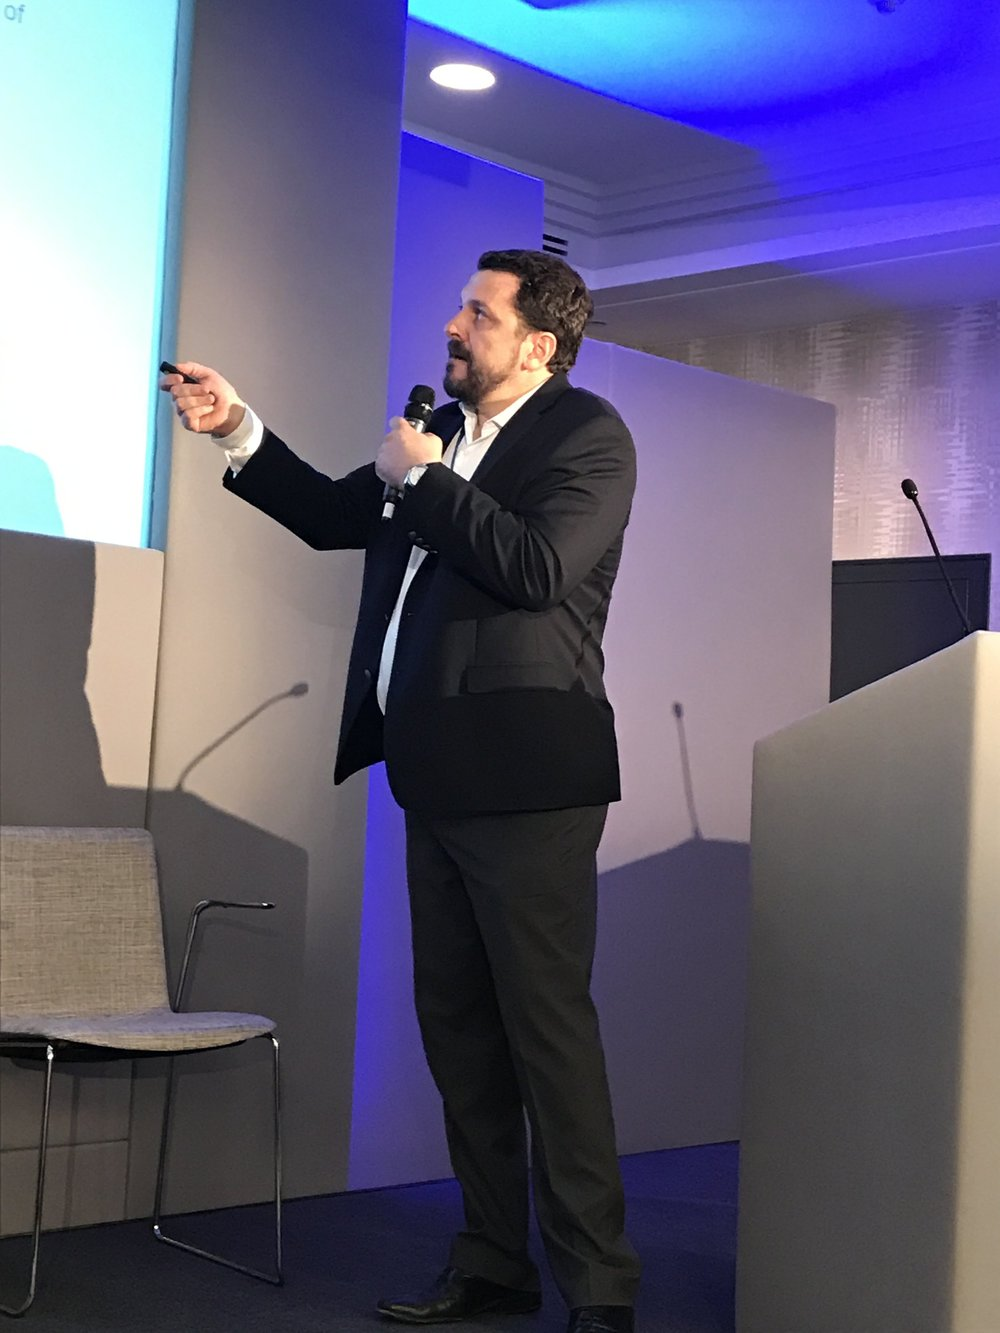 Dr. Hernan Amartino presenting.